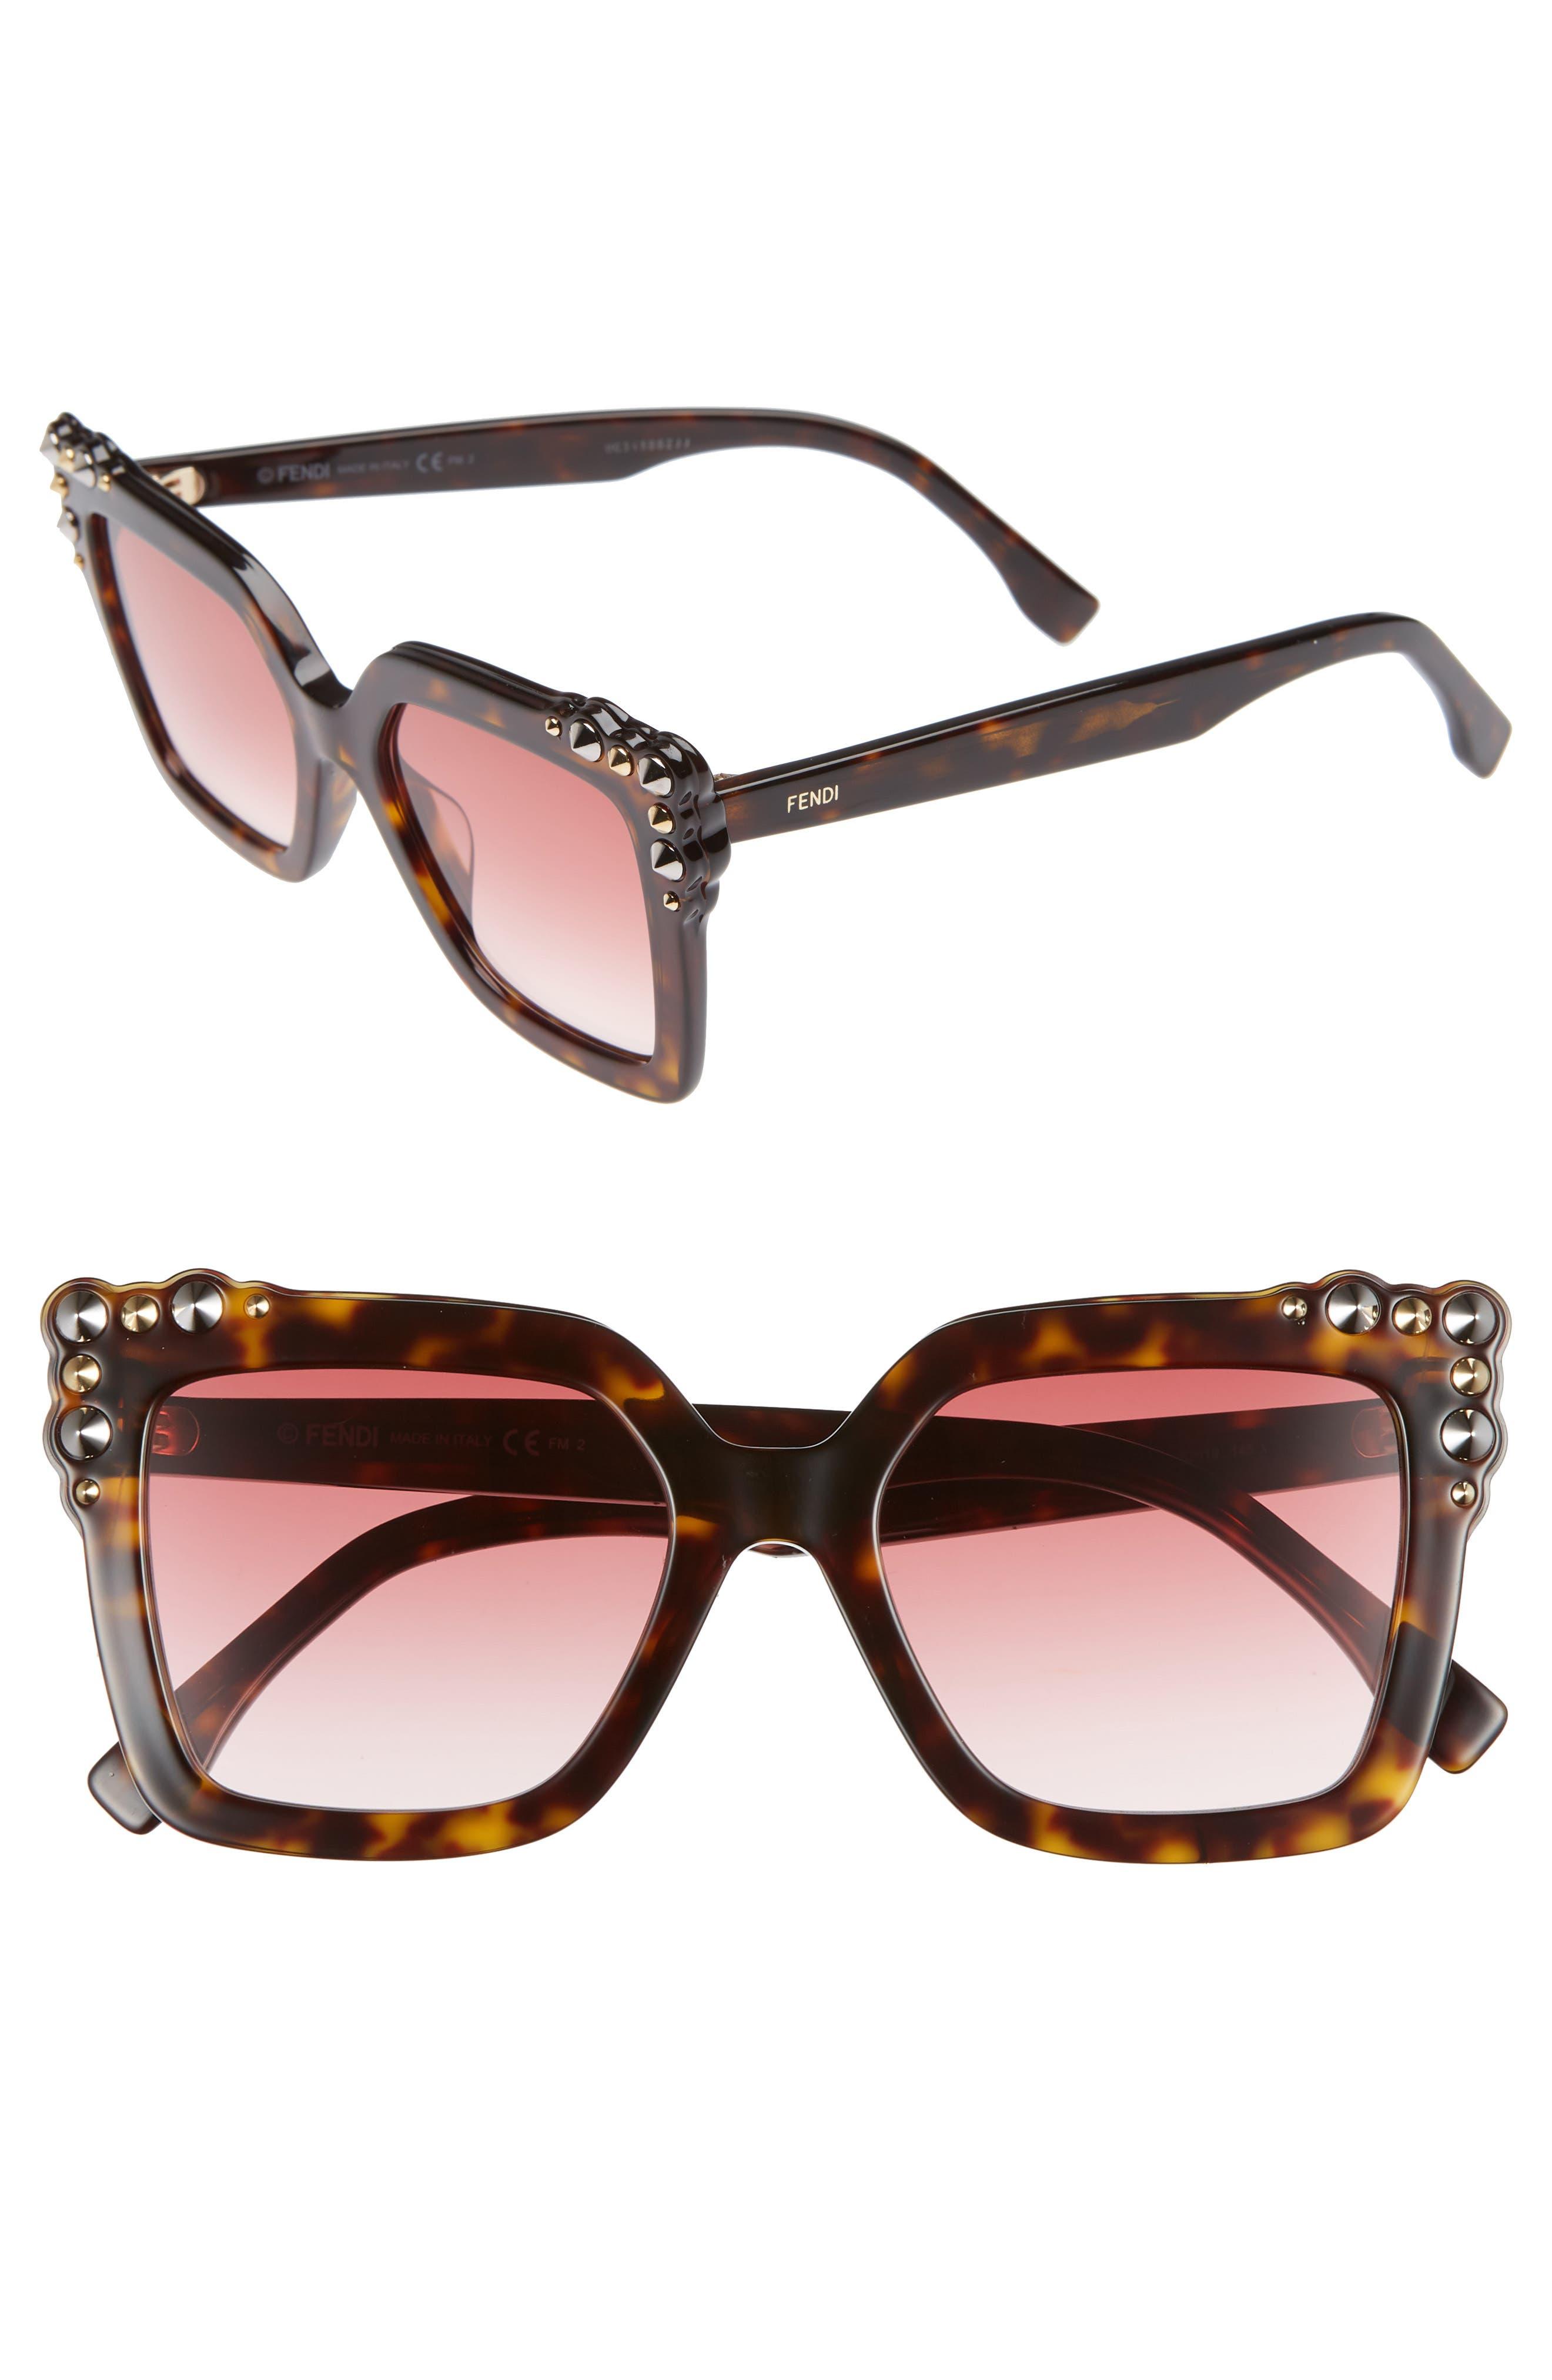 52mm Gradient Cat Eye Sunglasses,                         Main,                         color, DARK HAVANA